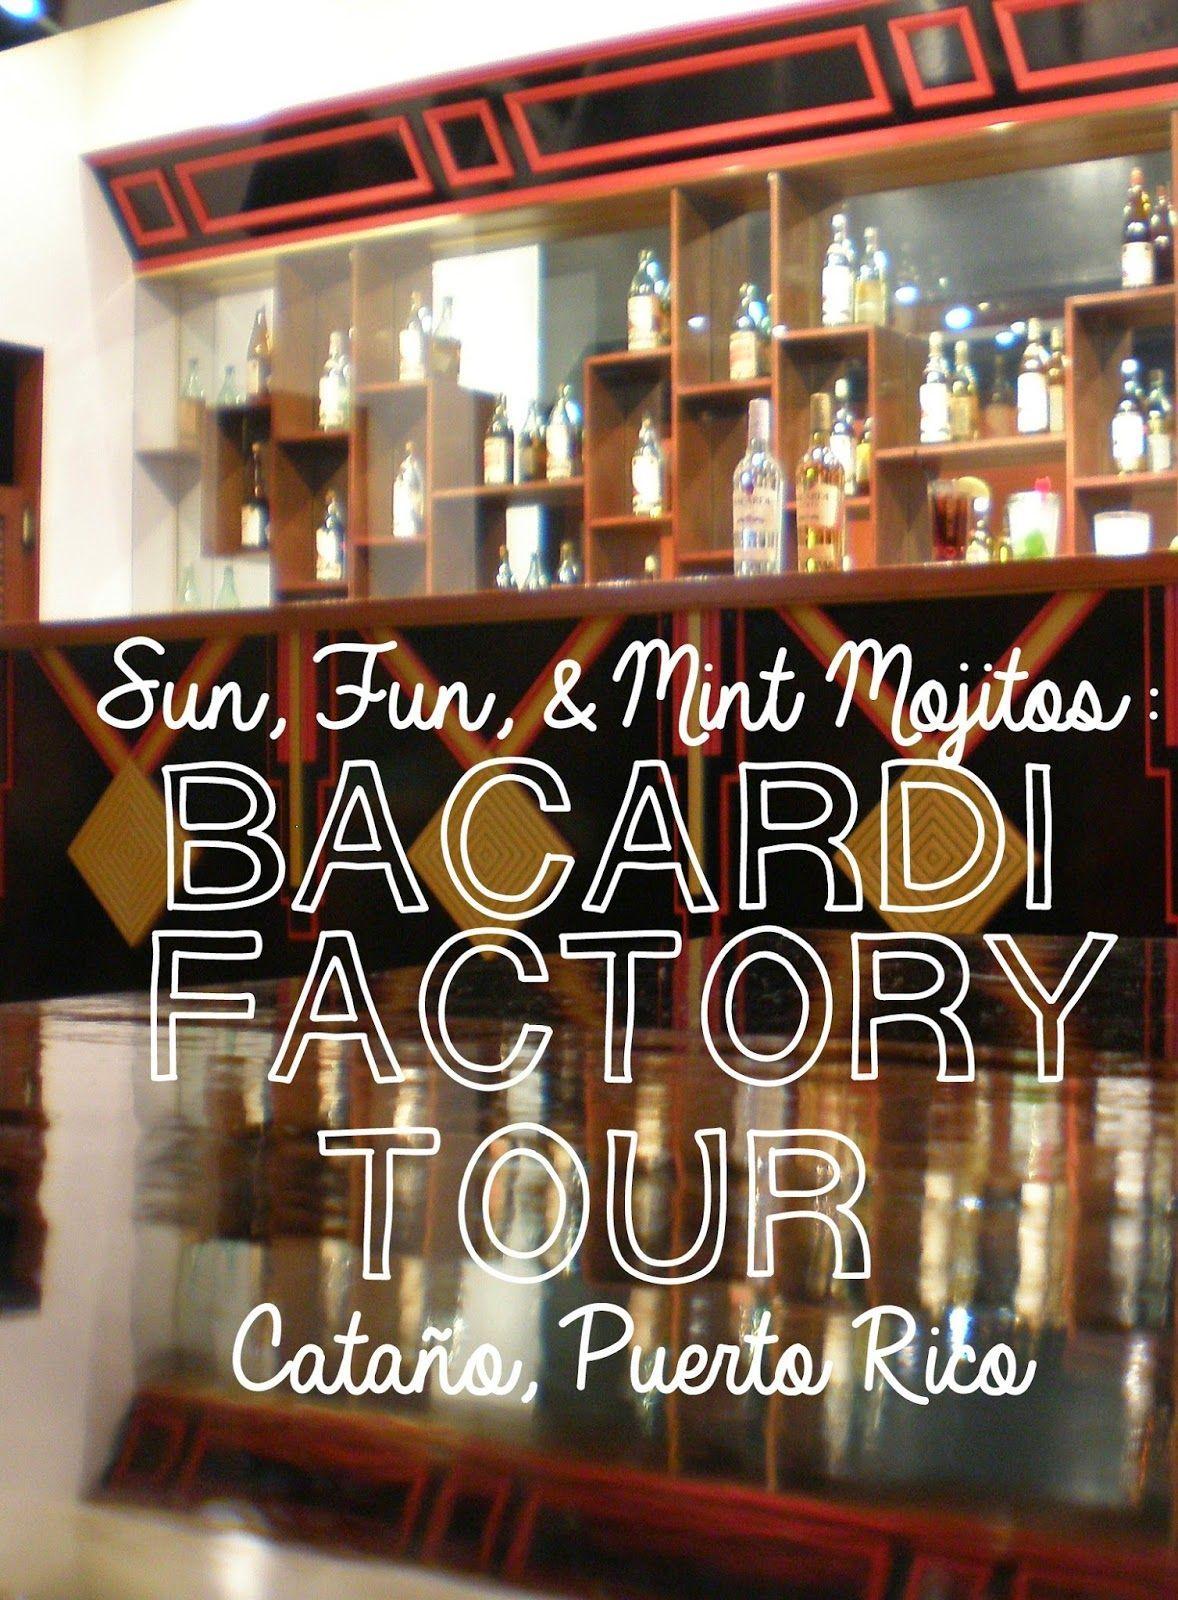 Fun, and Mint Mojitos: Bacardi Factory Tour, Puerto Rico Sun, Fun, and Mint Mojitos: Bacardi Factory Tour, Cantaño, Puerto Rico | Sun, Fun, and Mint Mojitos: Bacardi Factory Tour, Cantaño, Puerto Rico |